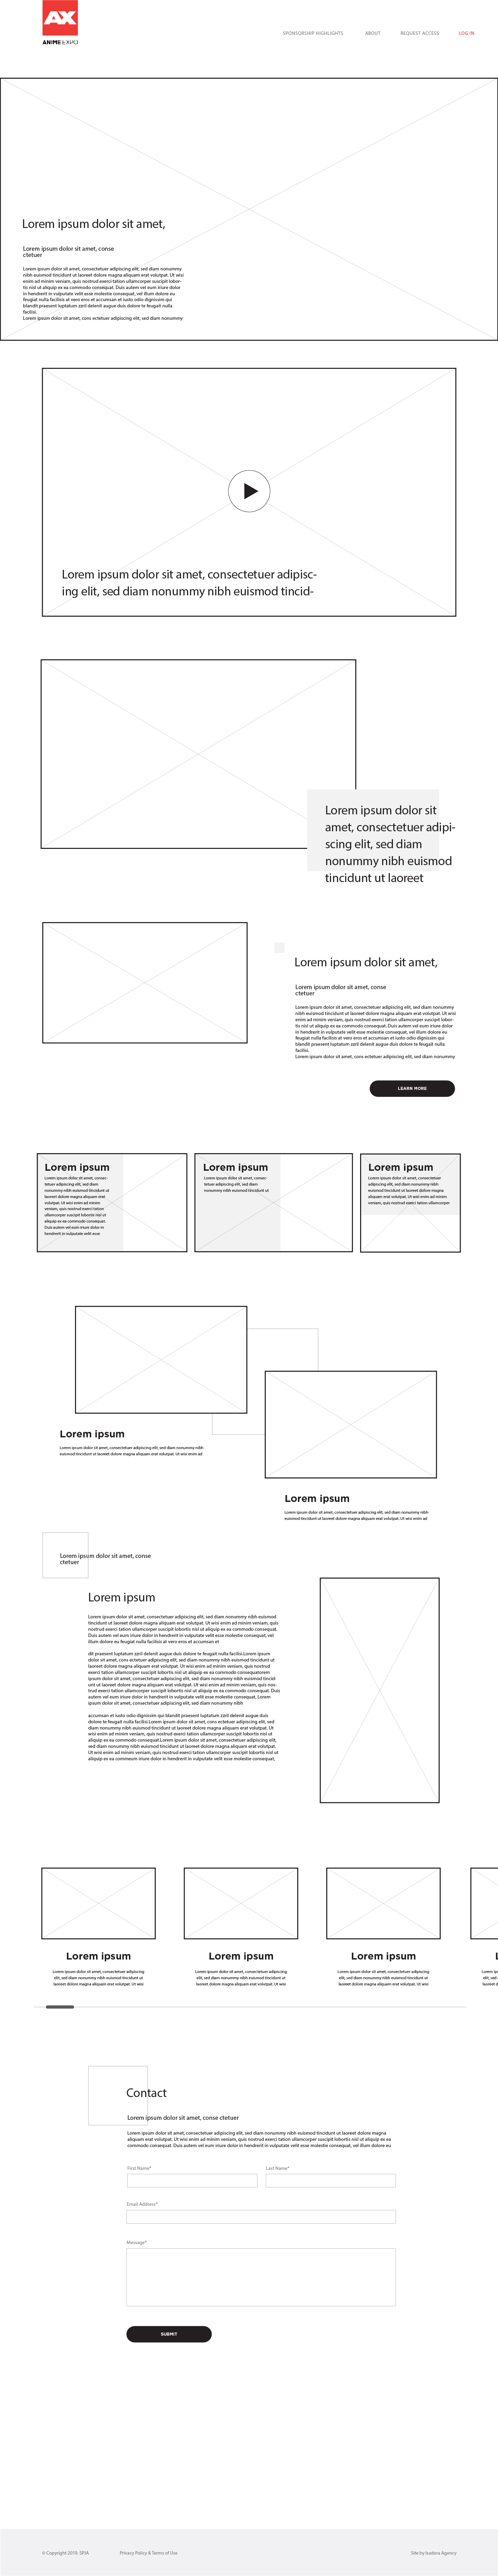 SPJA_Wireframe_Flex page-01.jpg